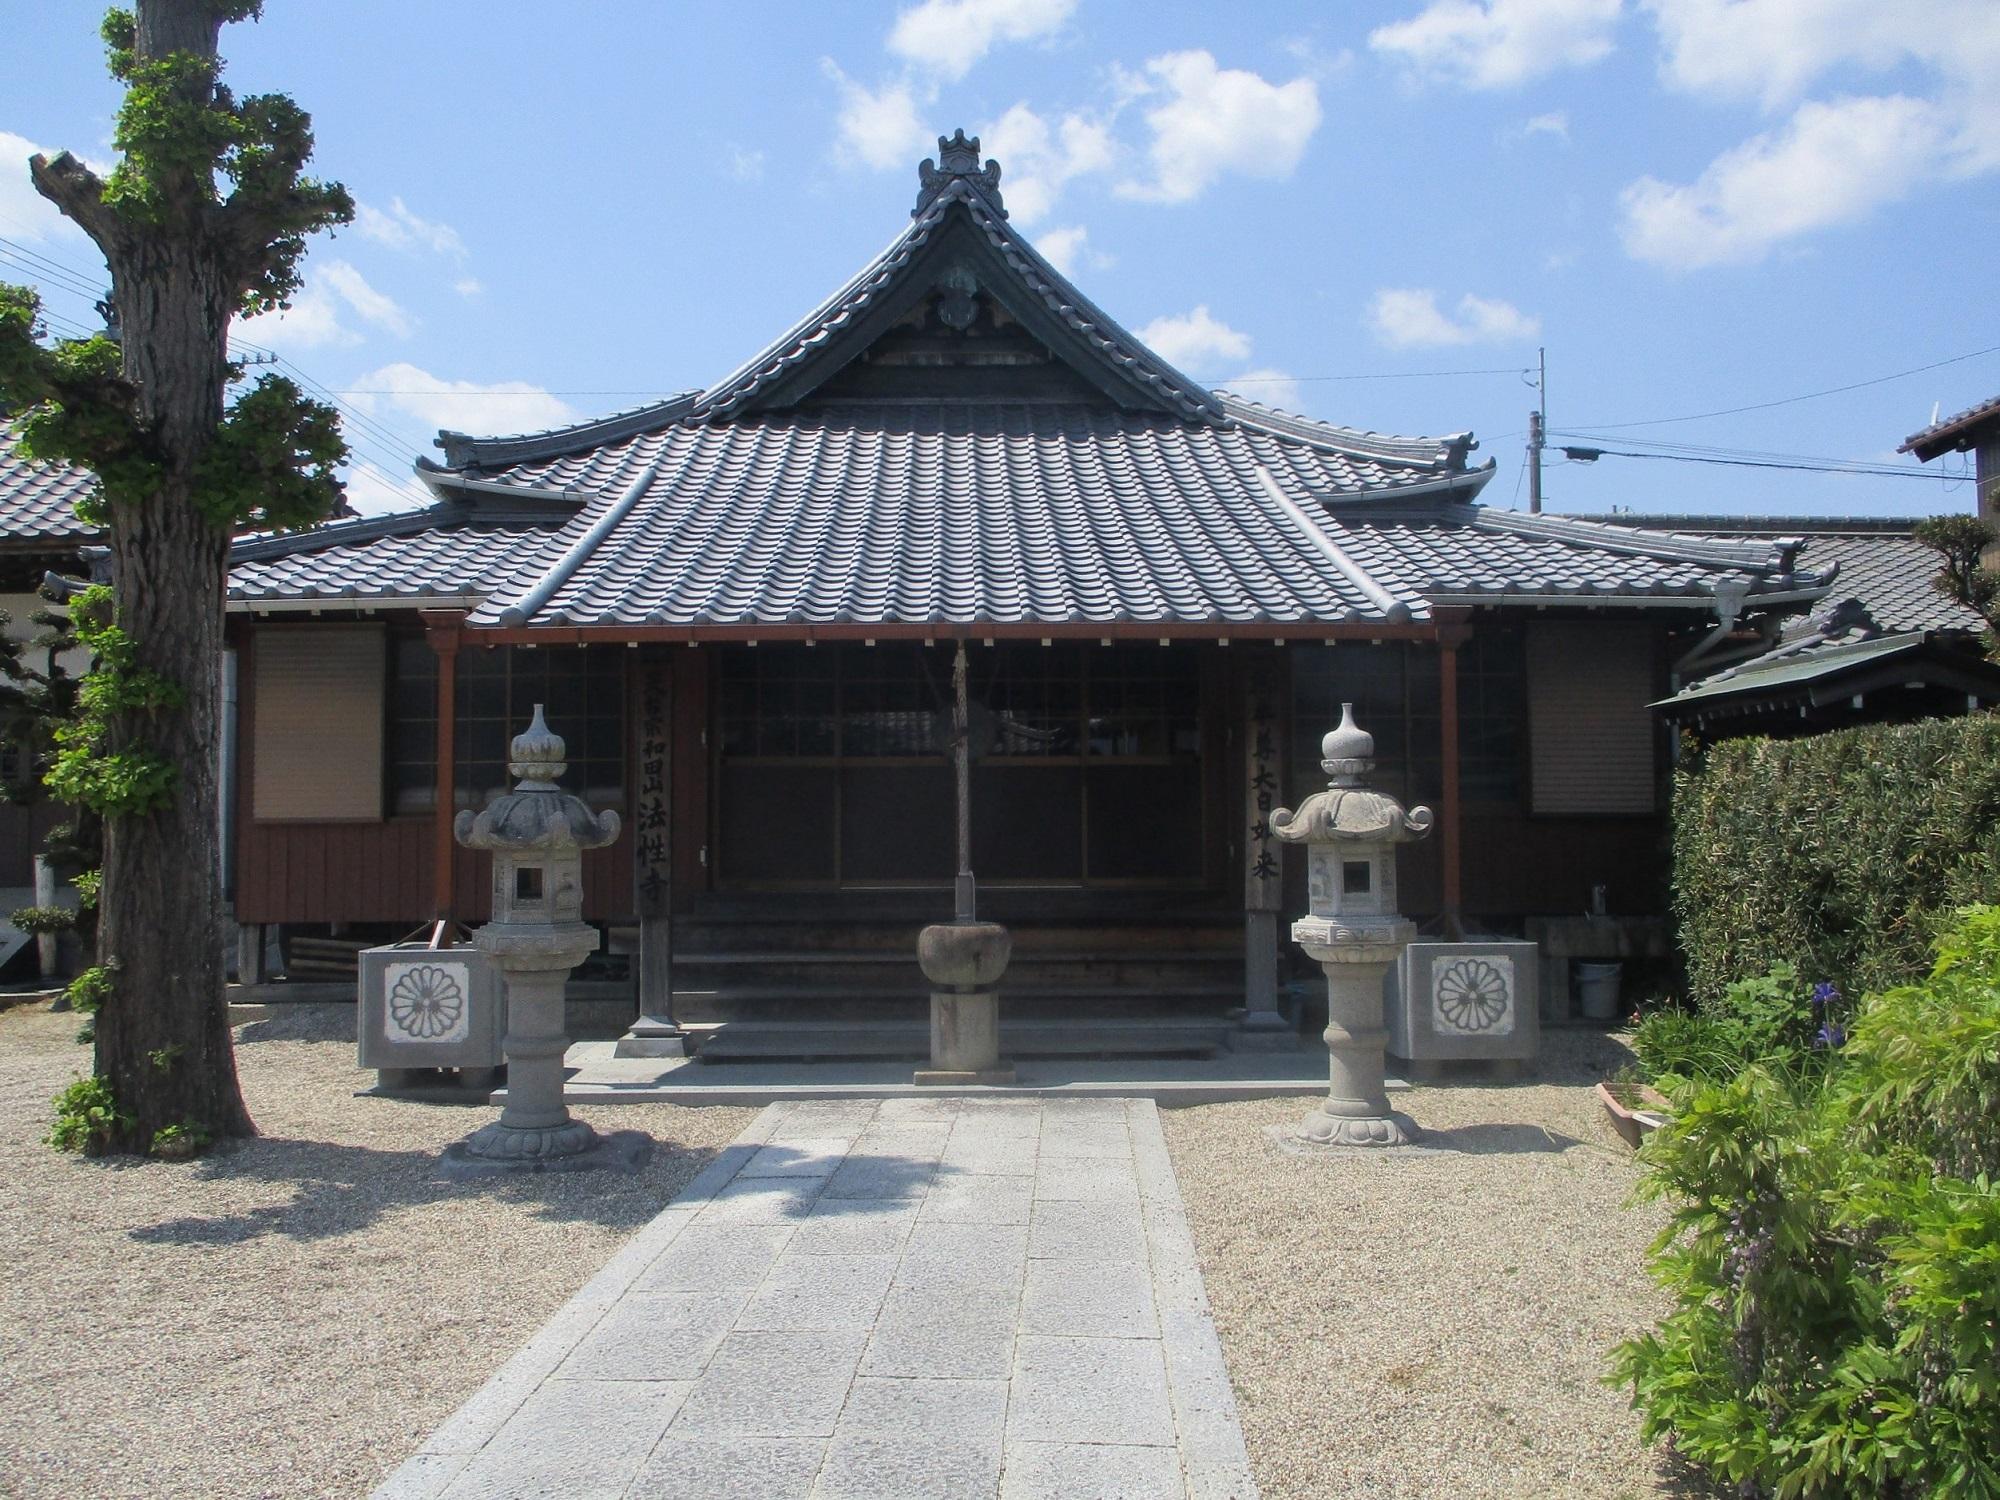 2020.4.28 (6) 法性寺 - 本堂 2000-1500